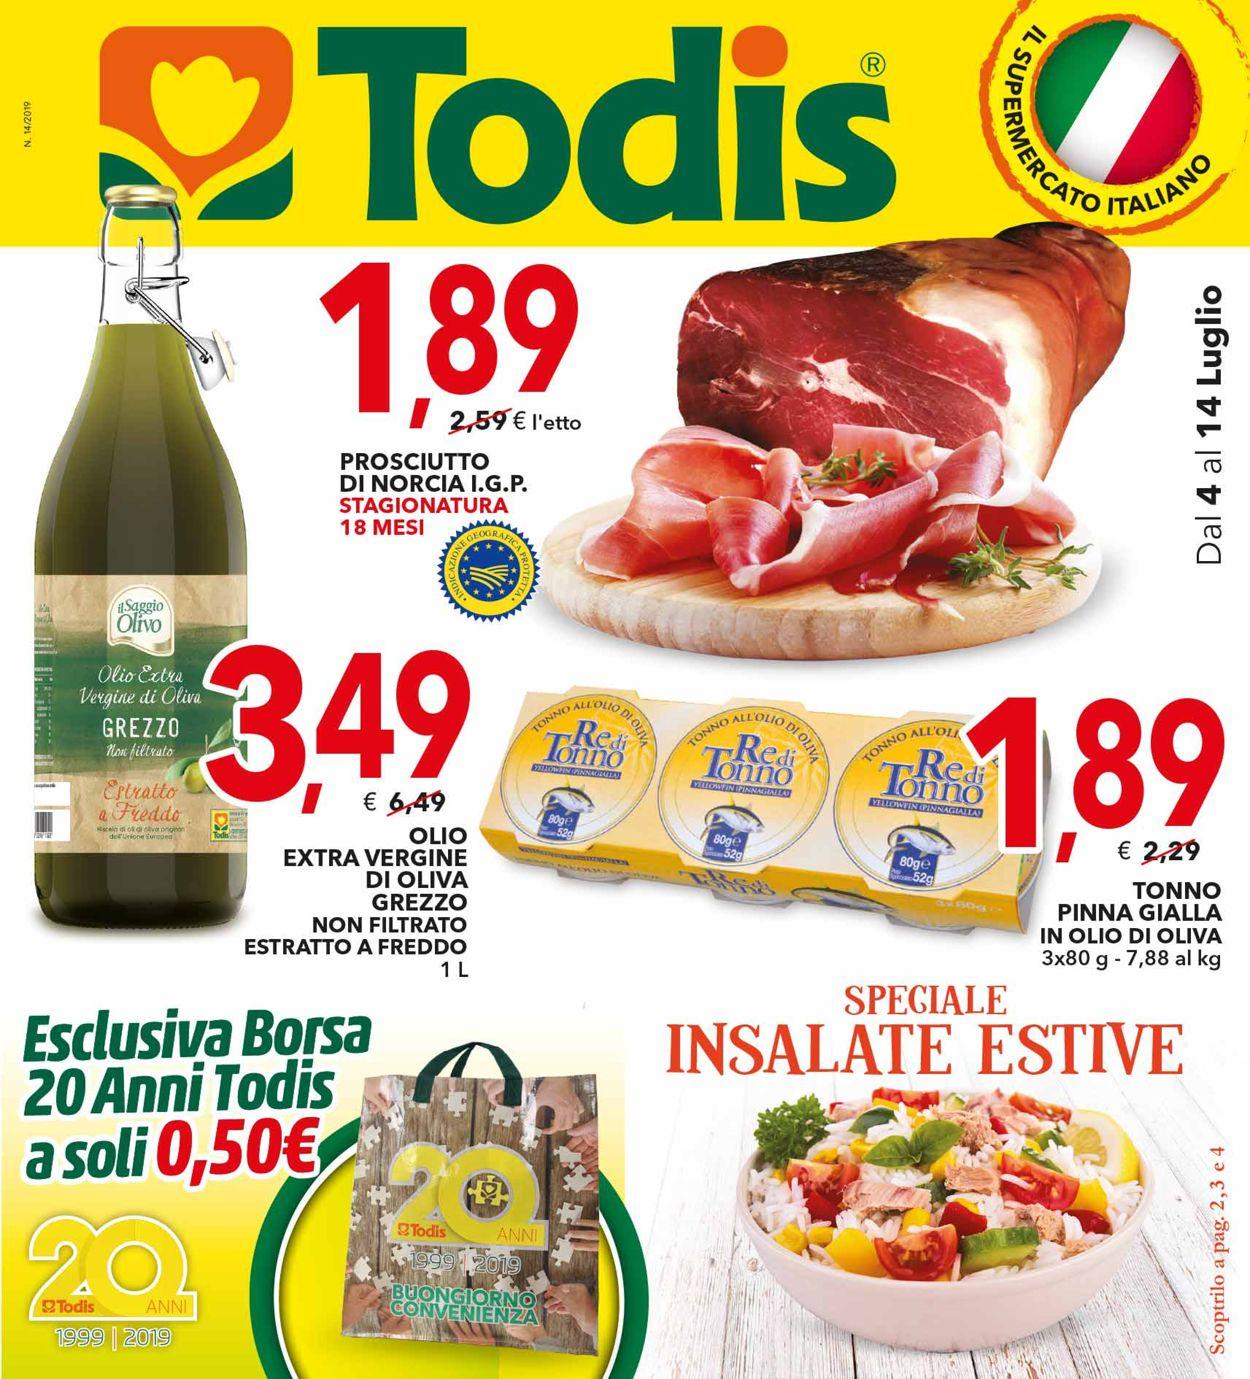 Volantino Todis - Offerte 04/07-14/07/2019